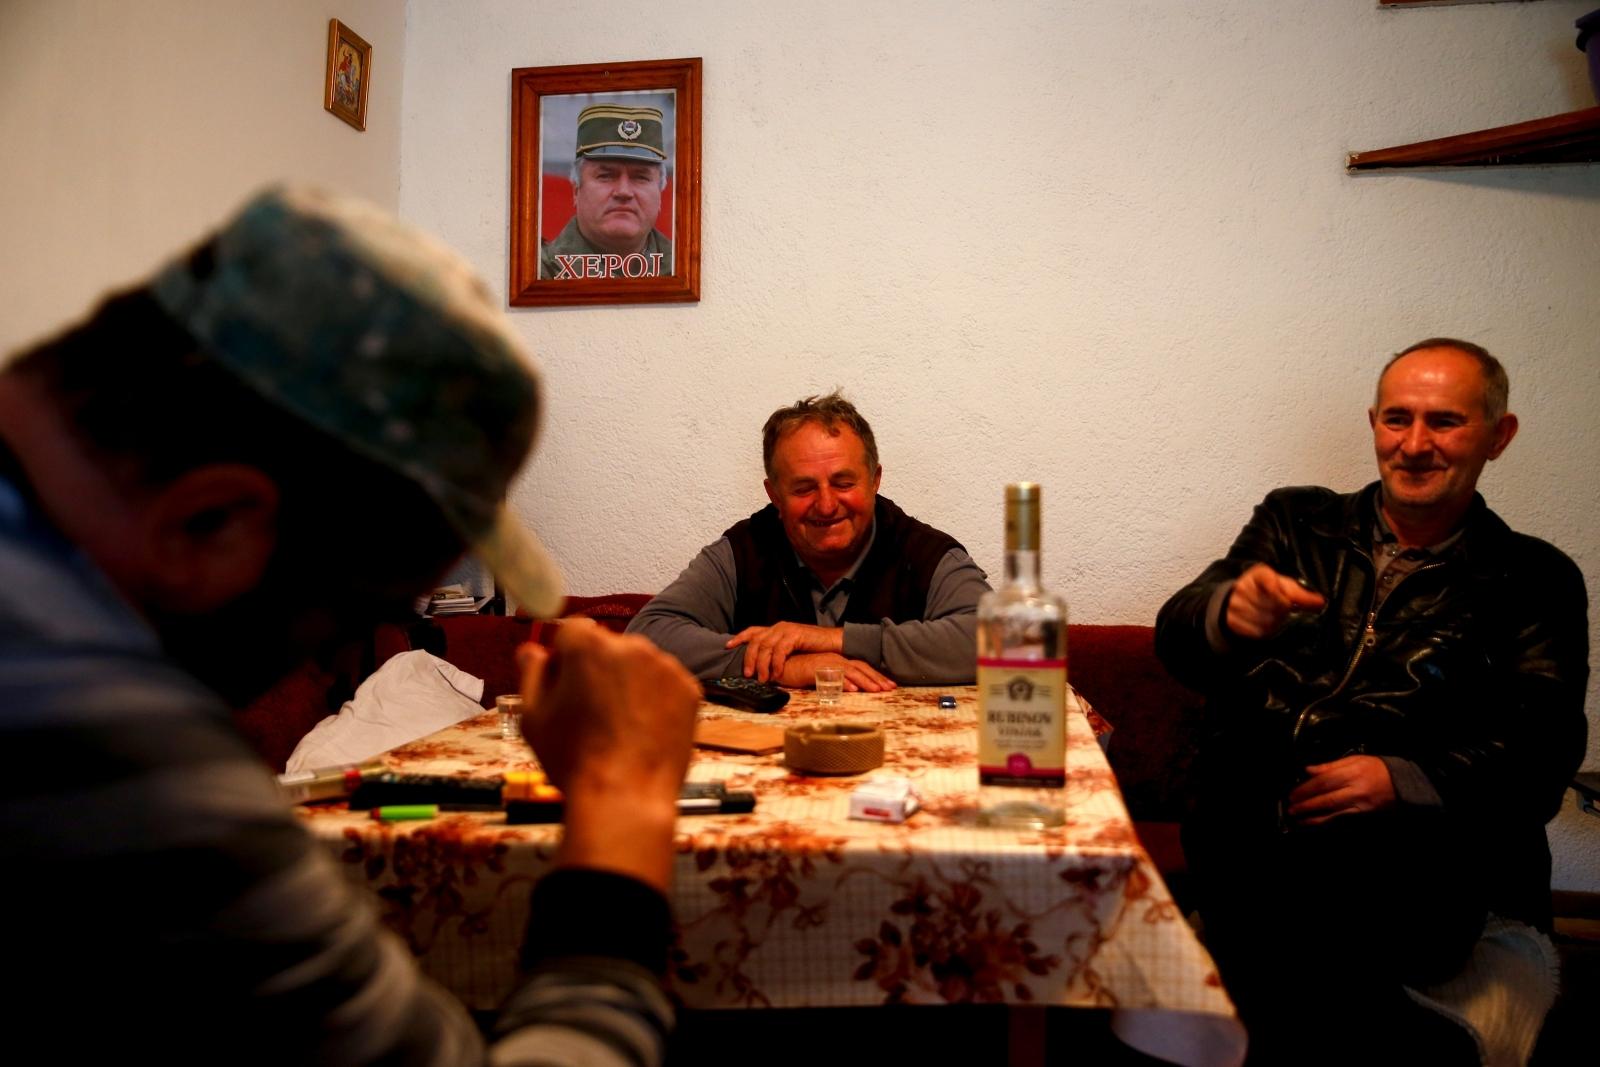 Bozanovici Ratko Mladic Srebrenica Bosnia